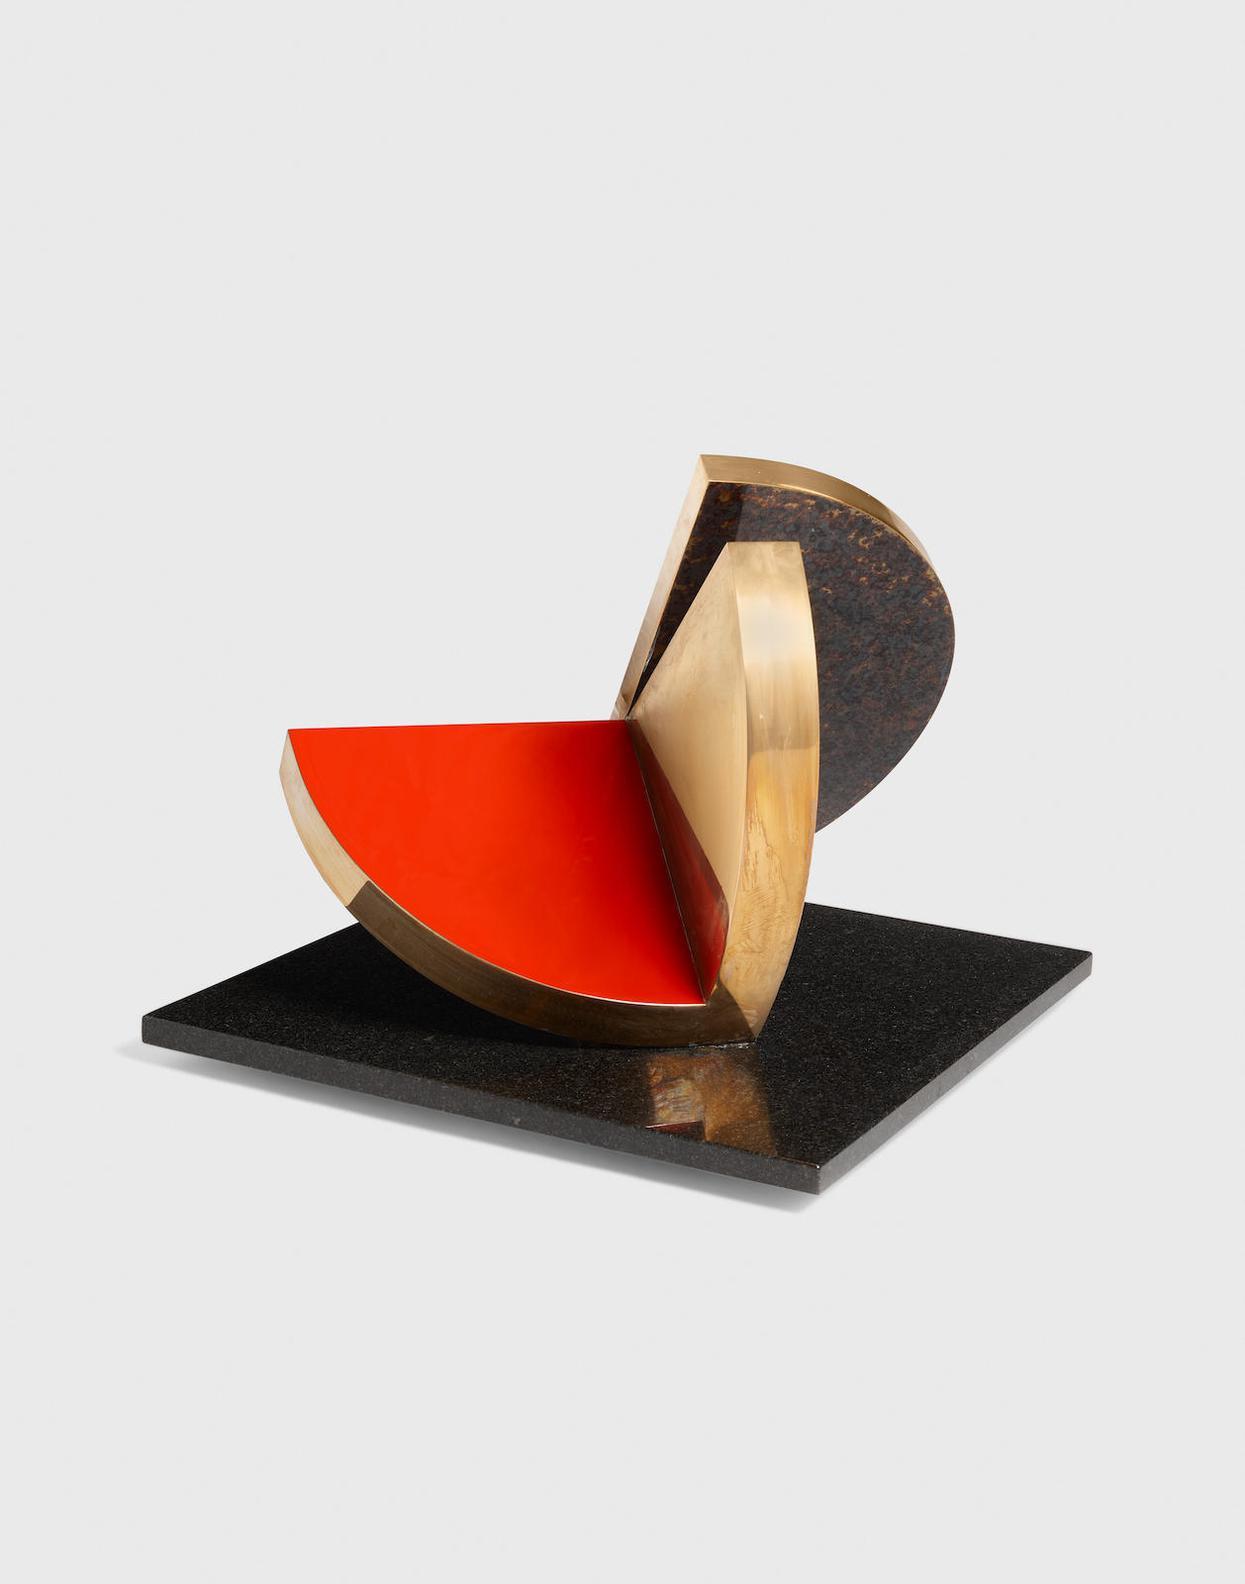 Fletcher Benton-Folded Semi-Circle-1977